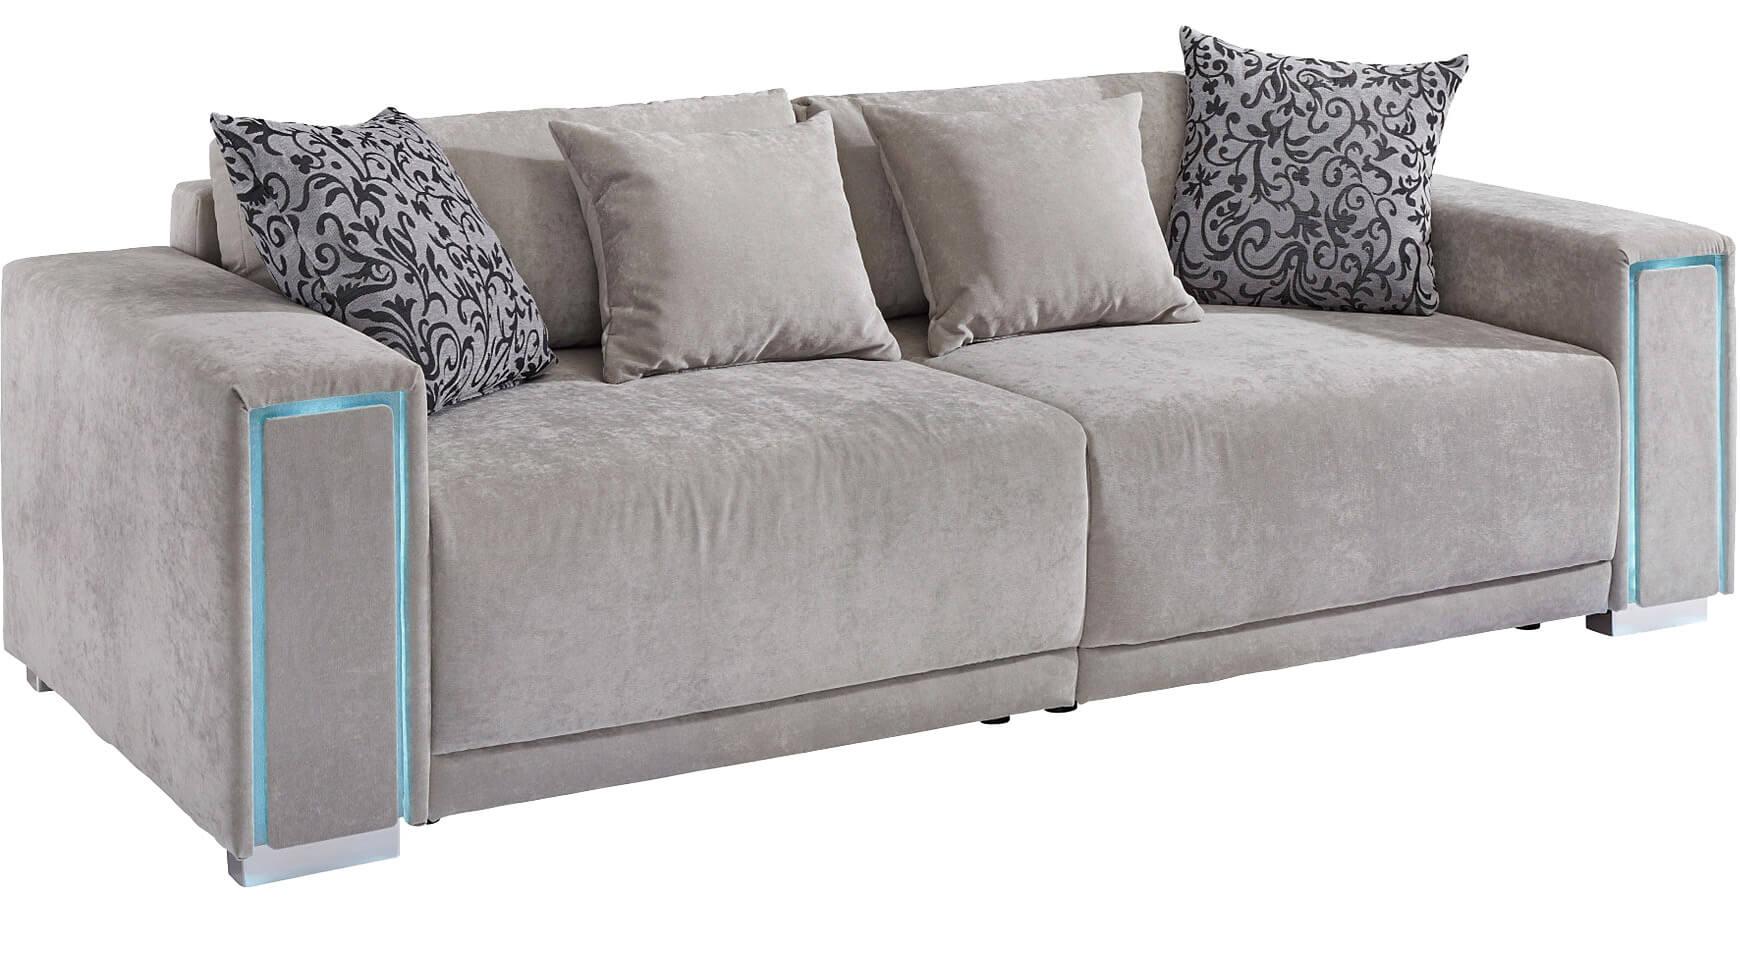 Full Size of Xxl Sofa Grau Couch Extragroe Sofas Bestellen Bei Cnouchde Mega Big Leder Landhaus Kaufen Ikea Mit Schlaffunktion Petrol Günstig Hocker Wk Alcantara Graues Sofa Xxl Sofa Grau